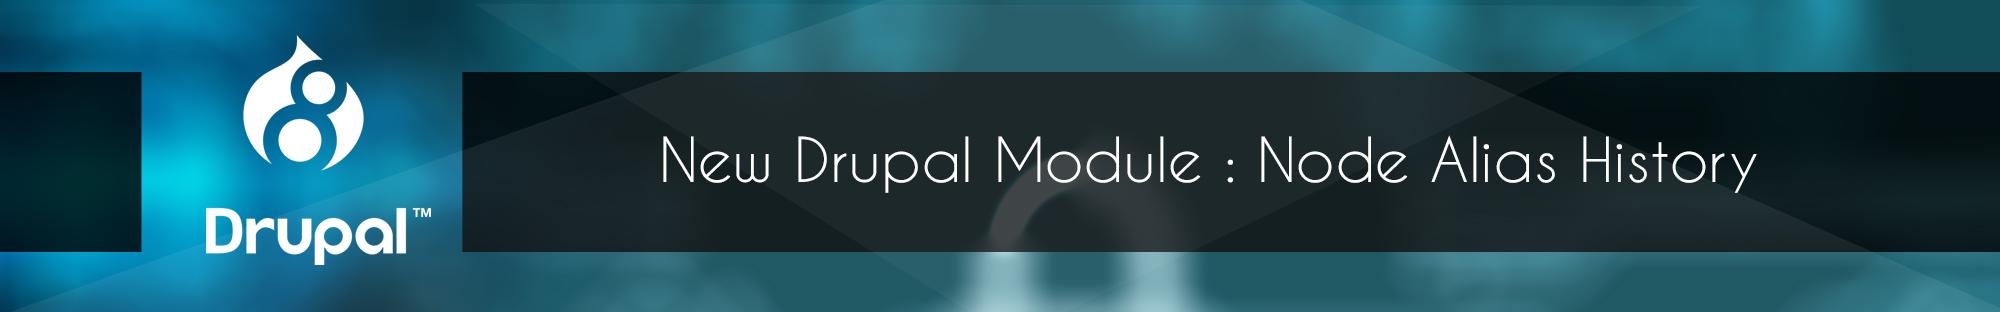 New Drupal Module Node Alias History_Blog